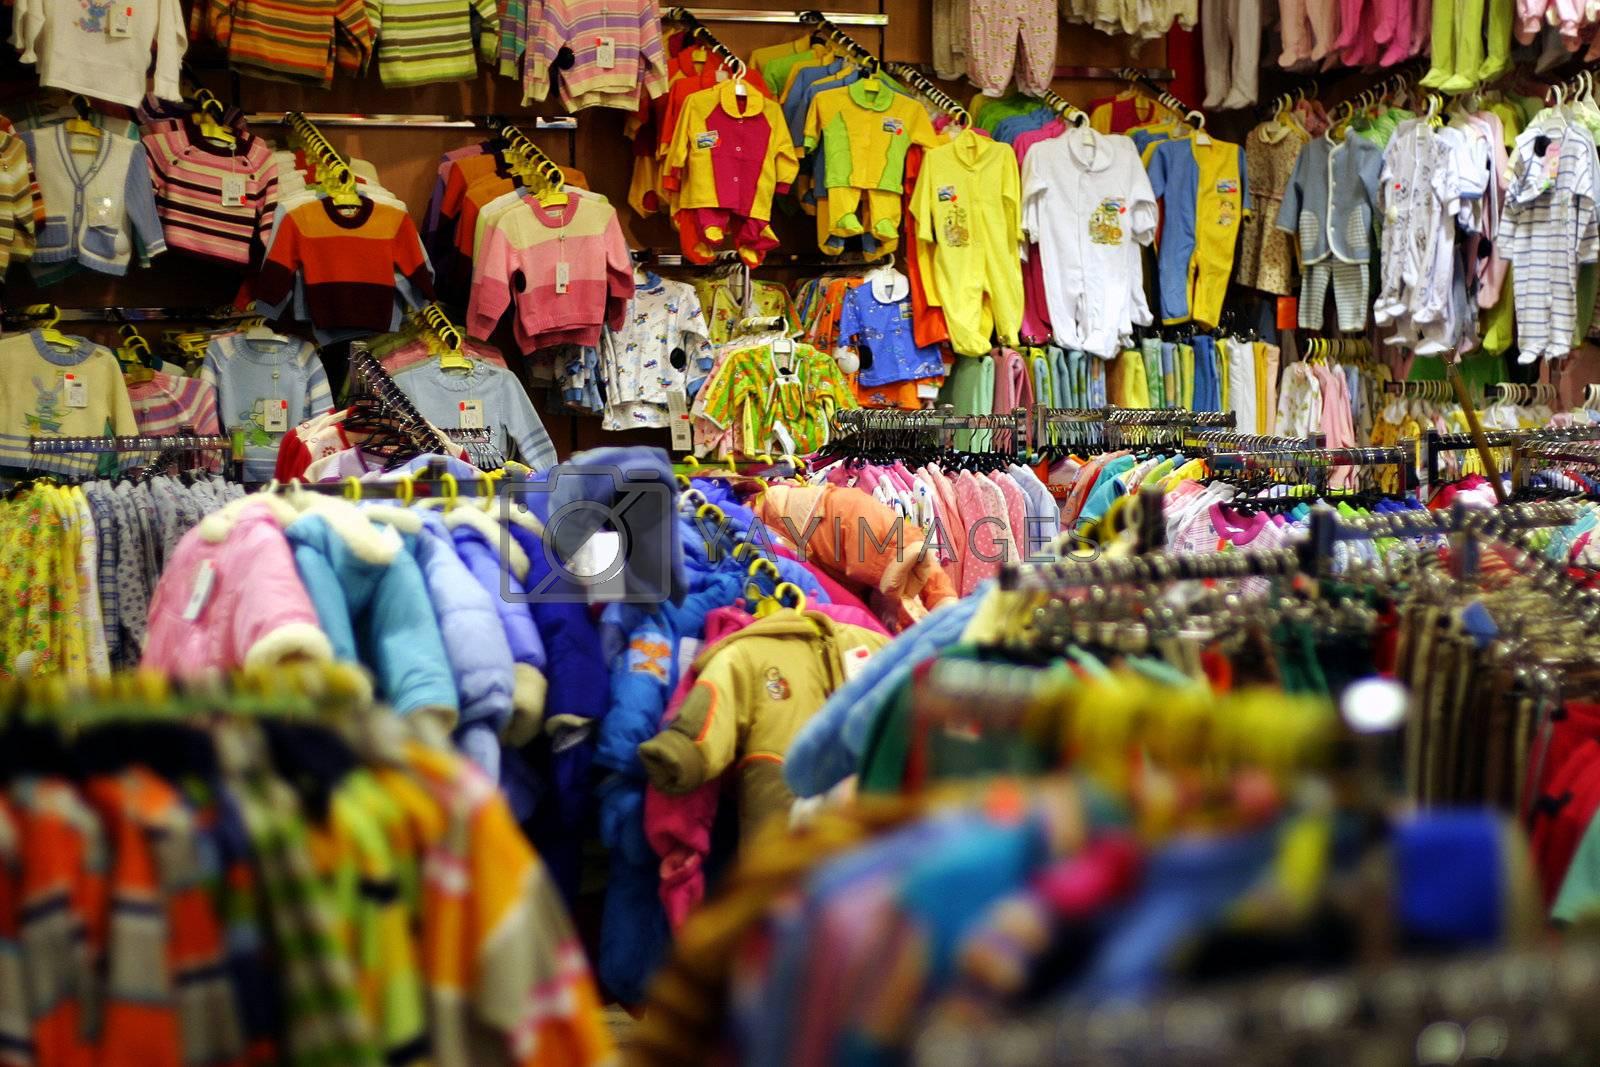 Babies clothes by Supertooper